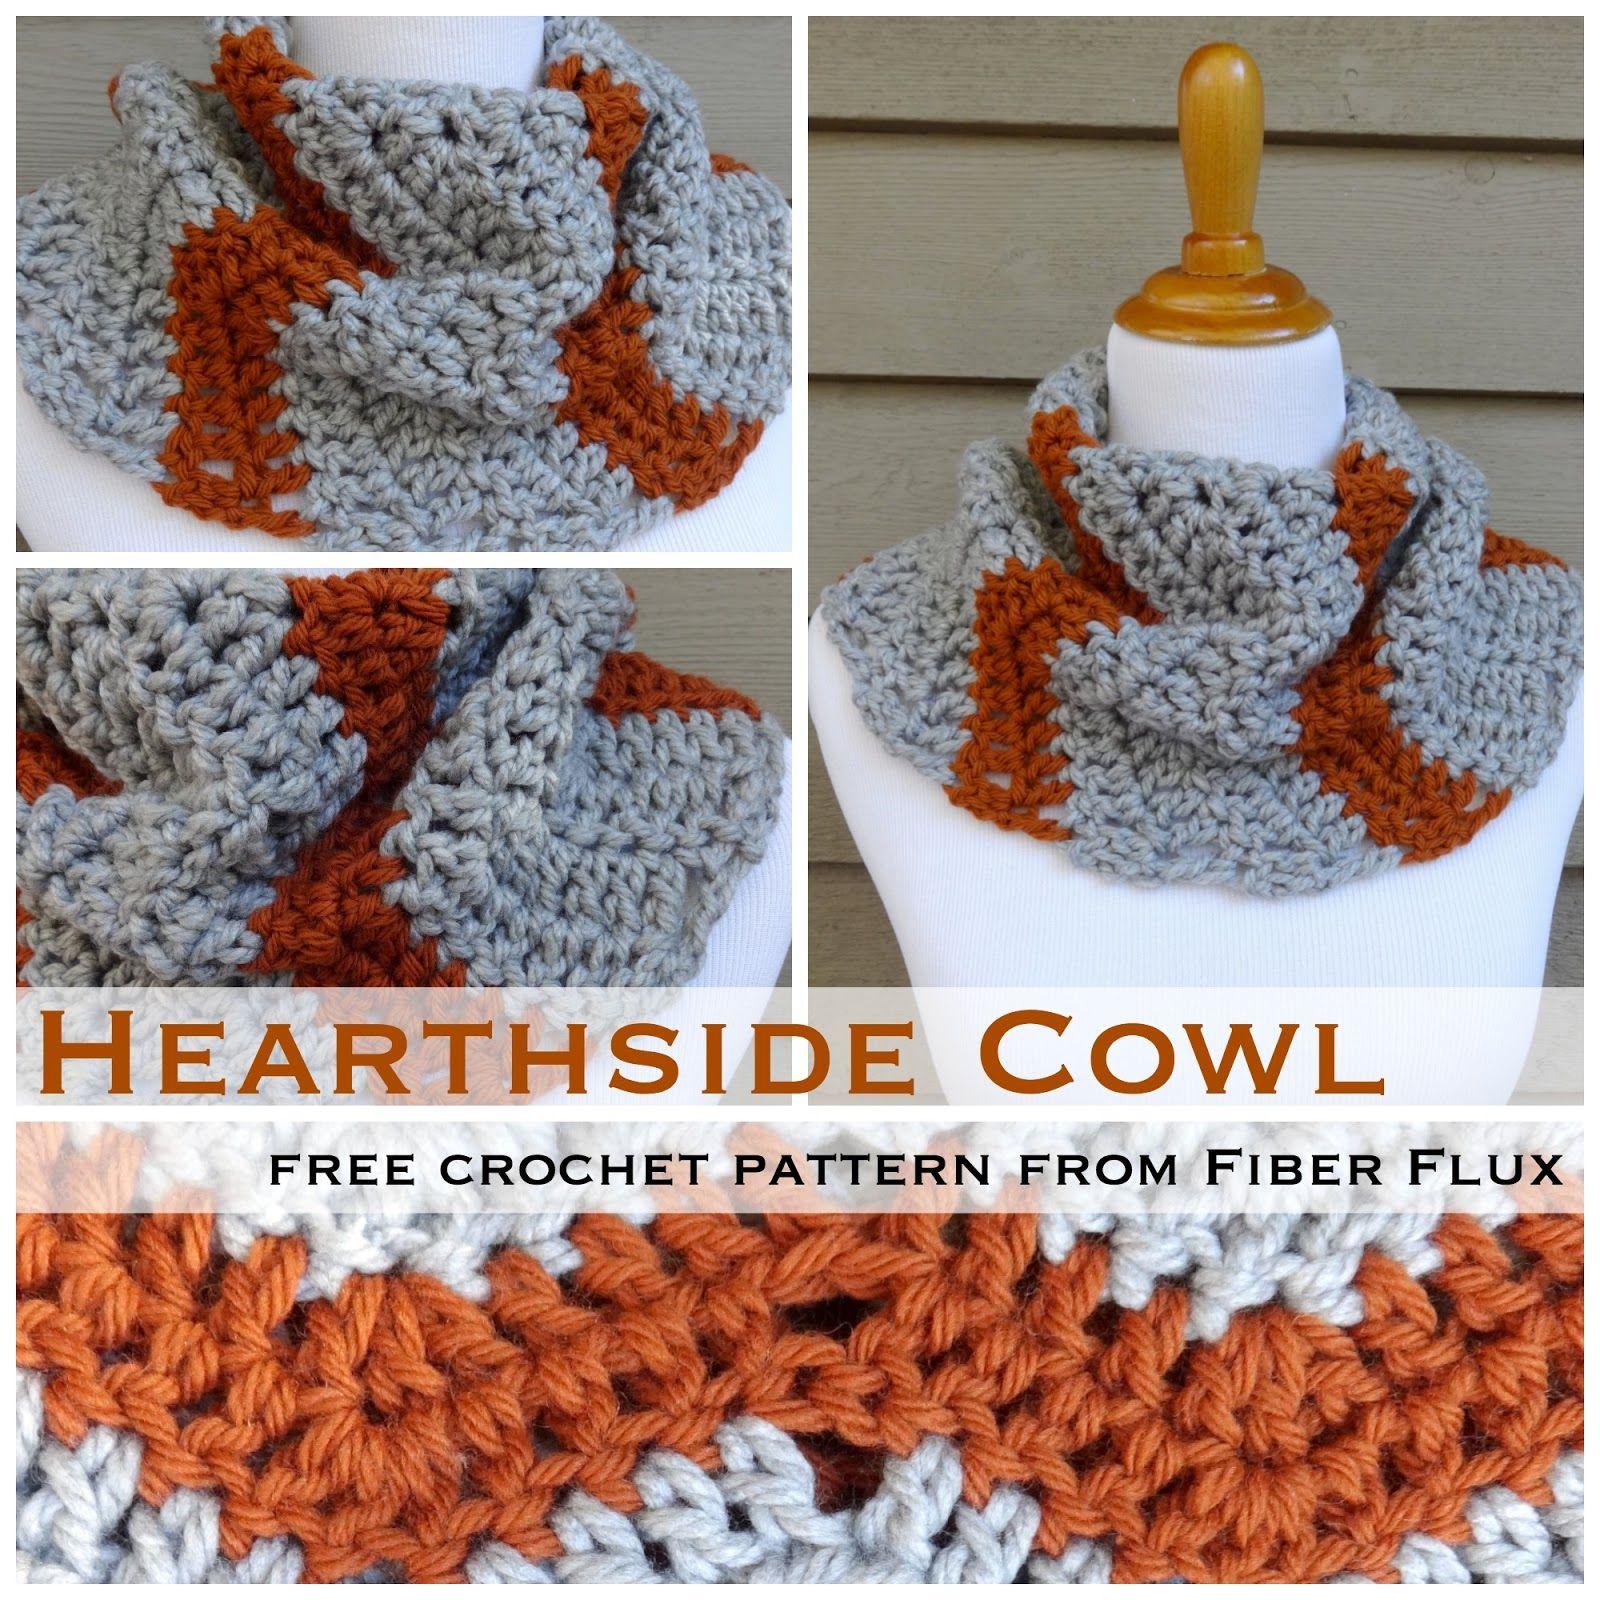 The Hearthside Cowl, a new and free crochet pattern from Fiber Flux ✿⊱╮Teresa Restegui http://www.pinterest.com/teretegui/✿⊱╮